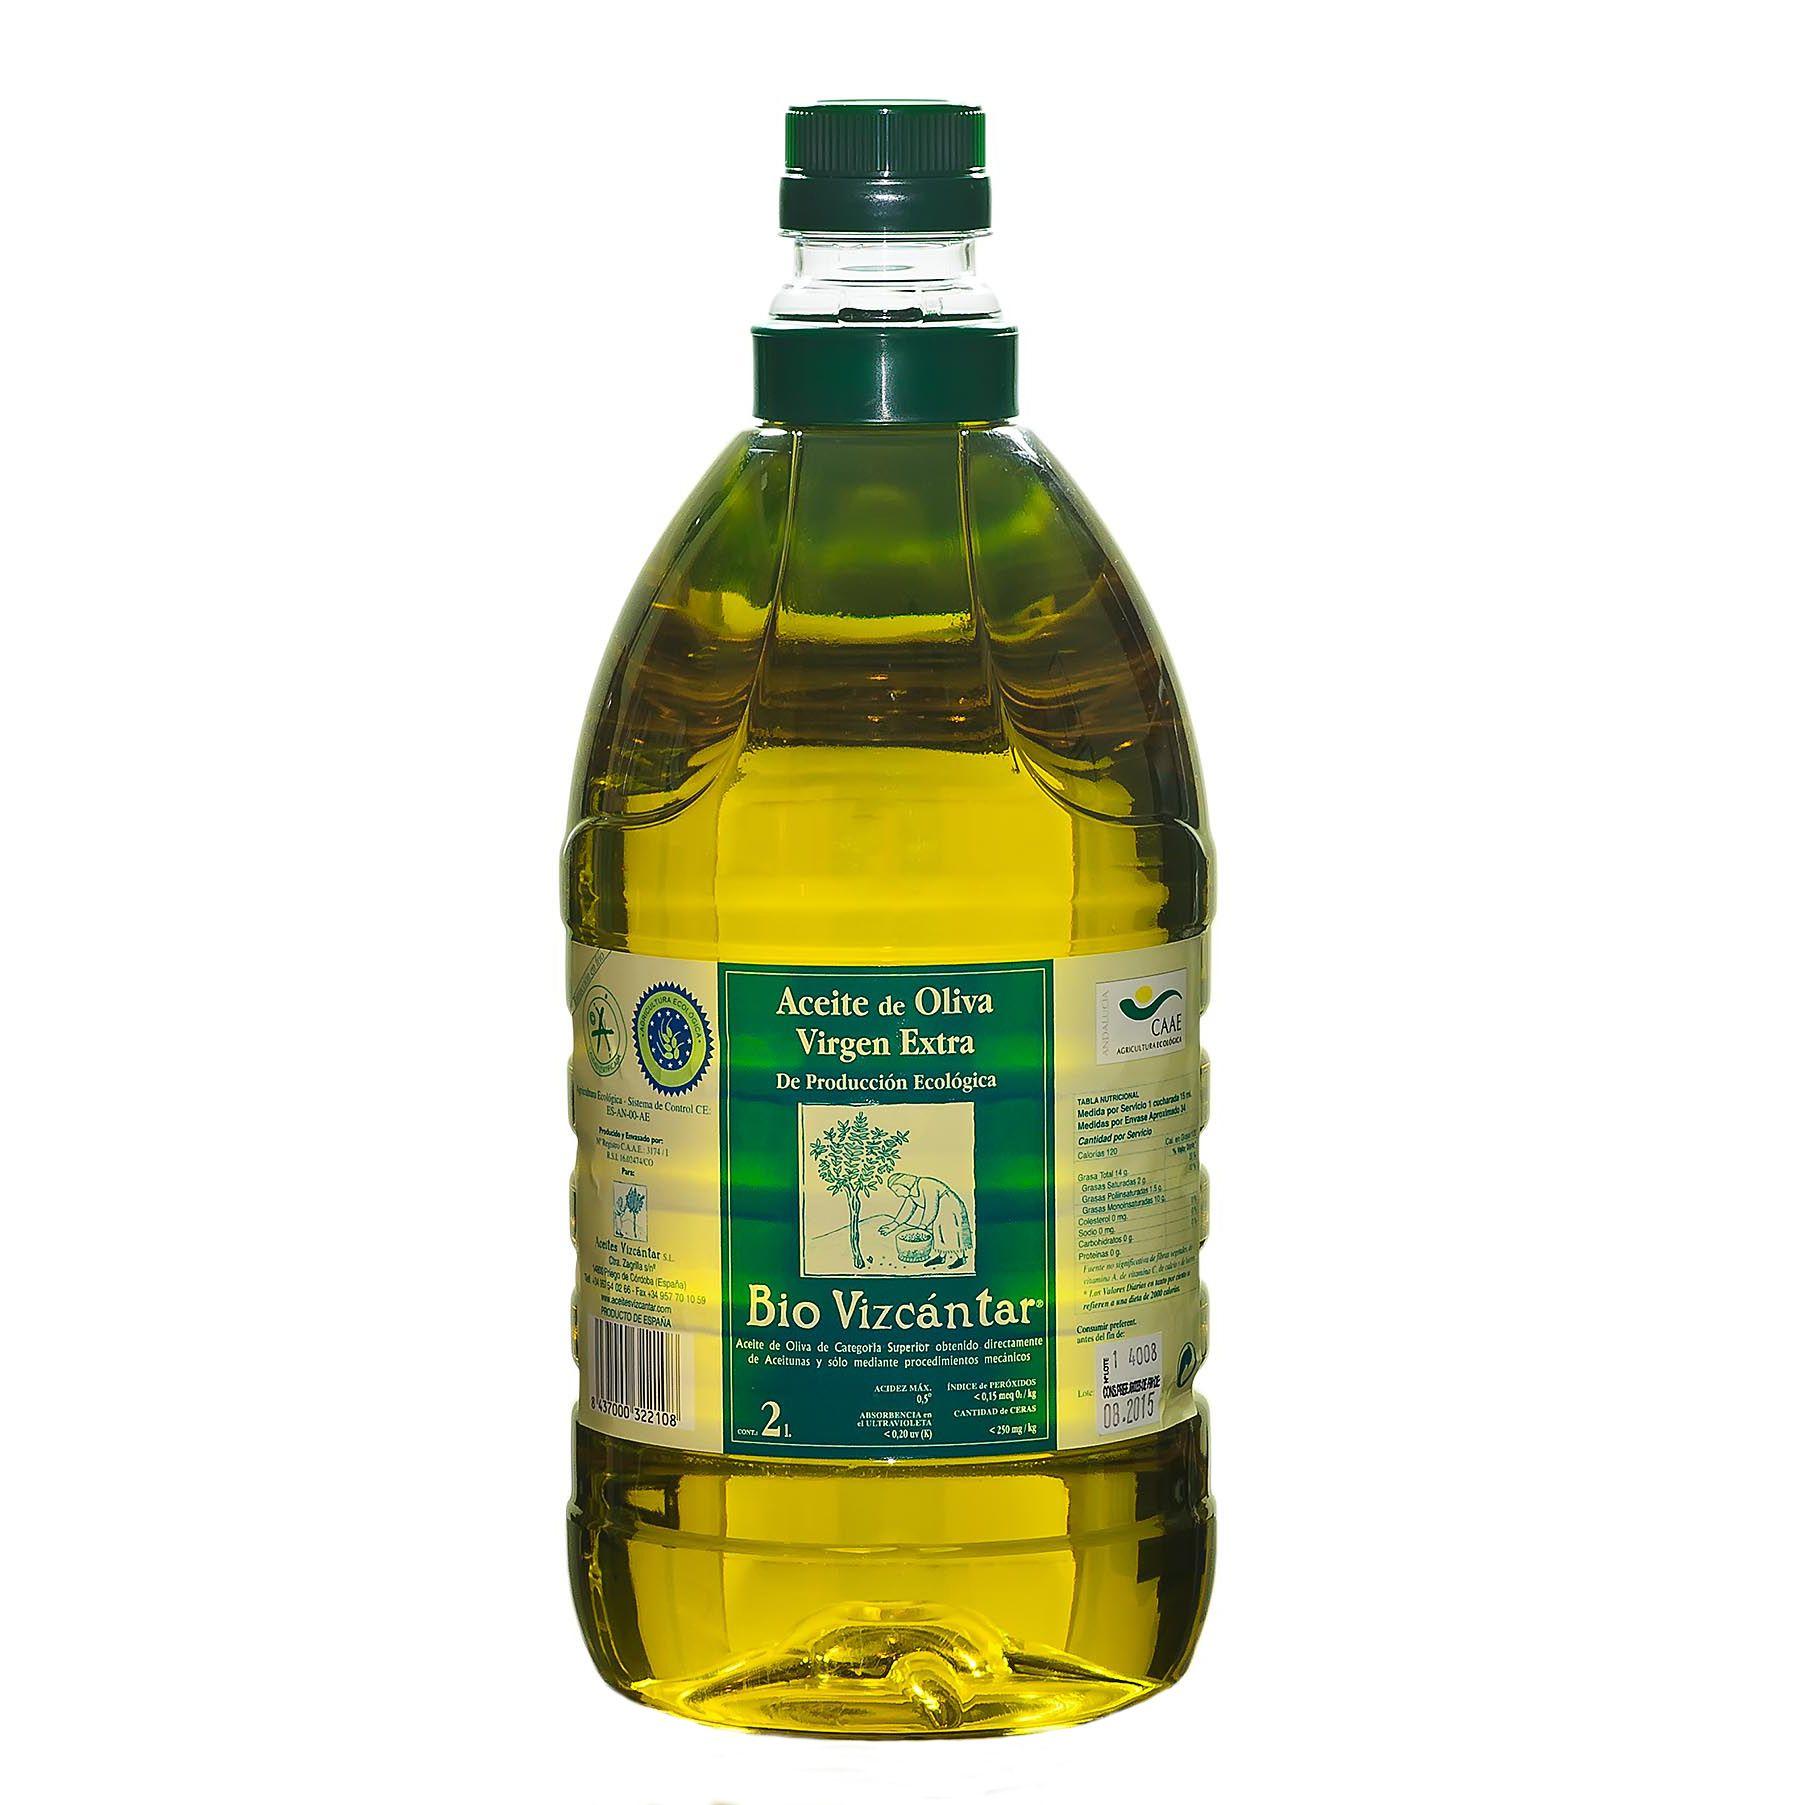 Aceite de oliva de producción ecológica. Bio Vizcántar elaborado en Priego de Córdoba, subbética andaluza. Cómpralo en www.olivadelsur.com